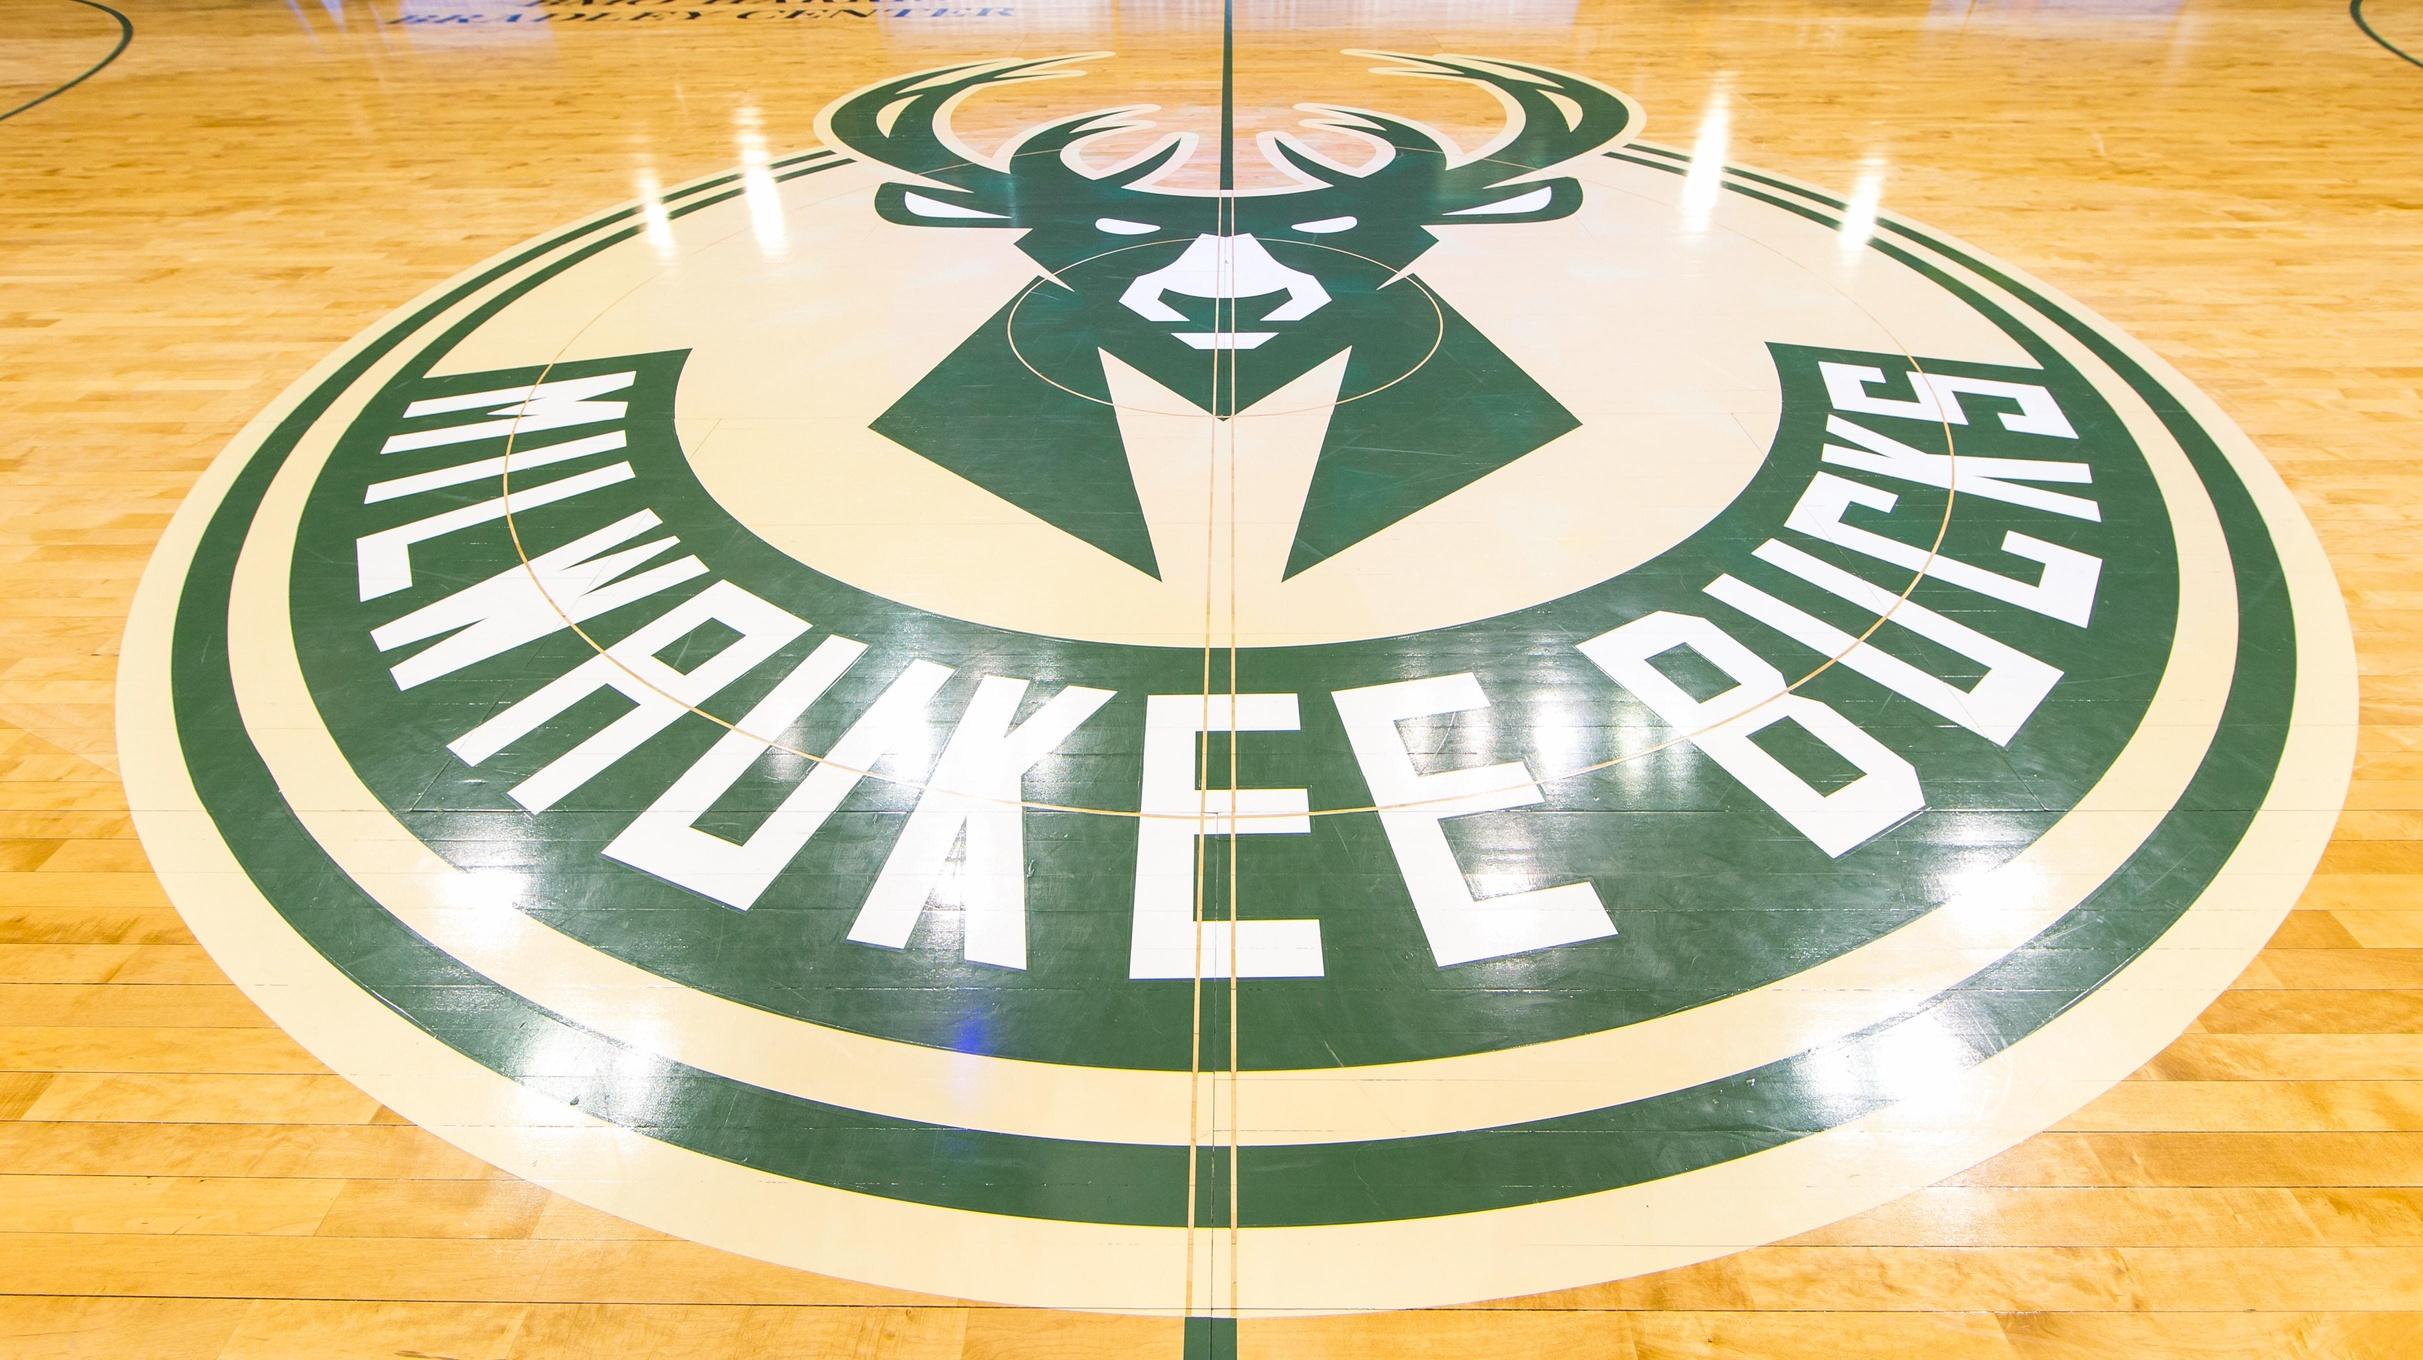 Caption: Mar 30, 2016; Milwaukee, WI, USA; The Milwaukee Bucks logo on the floor prior o the game against the Phoenix Suns at BMO Harris Bradley Center. Milwaukee won 105-94. Mandatory Credit: Jeff Hanisch-USA TODAY Sports